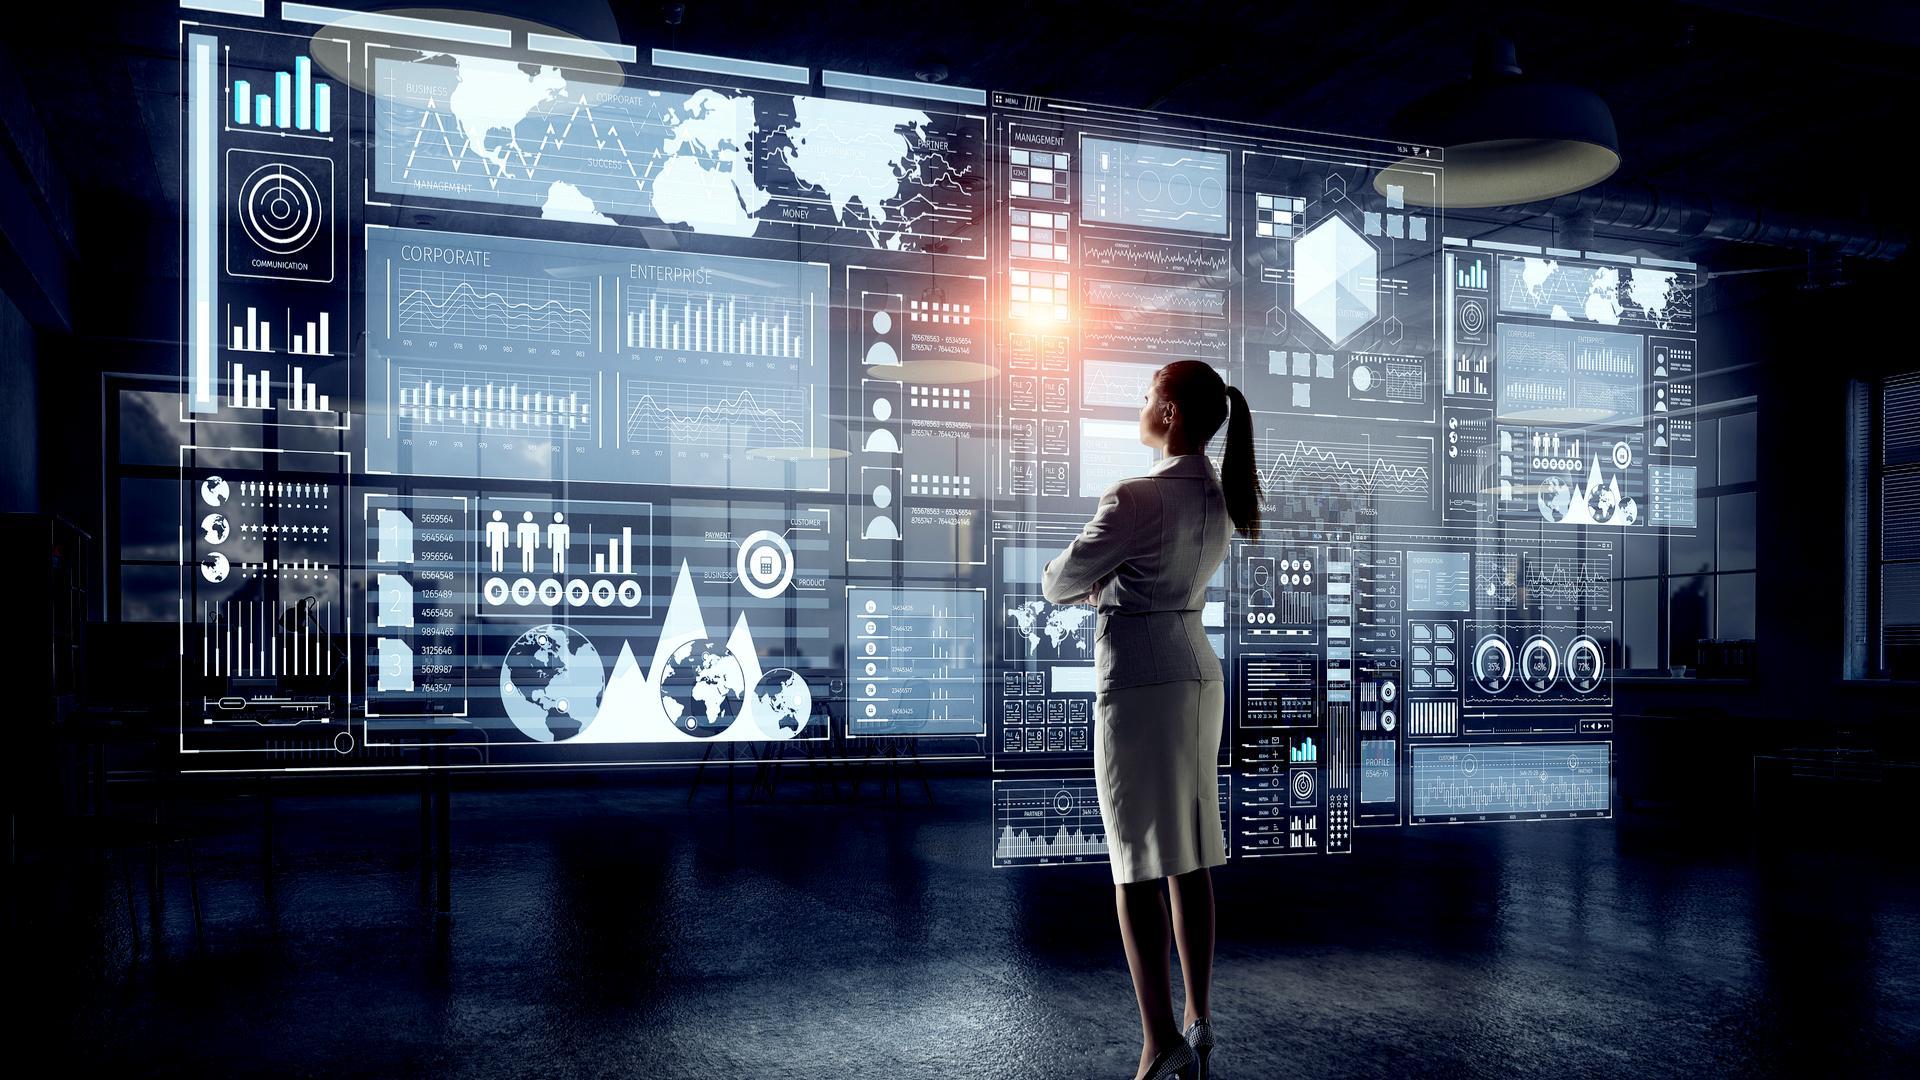 Atechup © Big Data & Analytics Entrepreneurship ™ Certification Ottawa